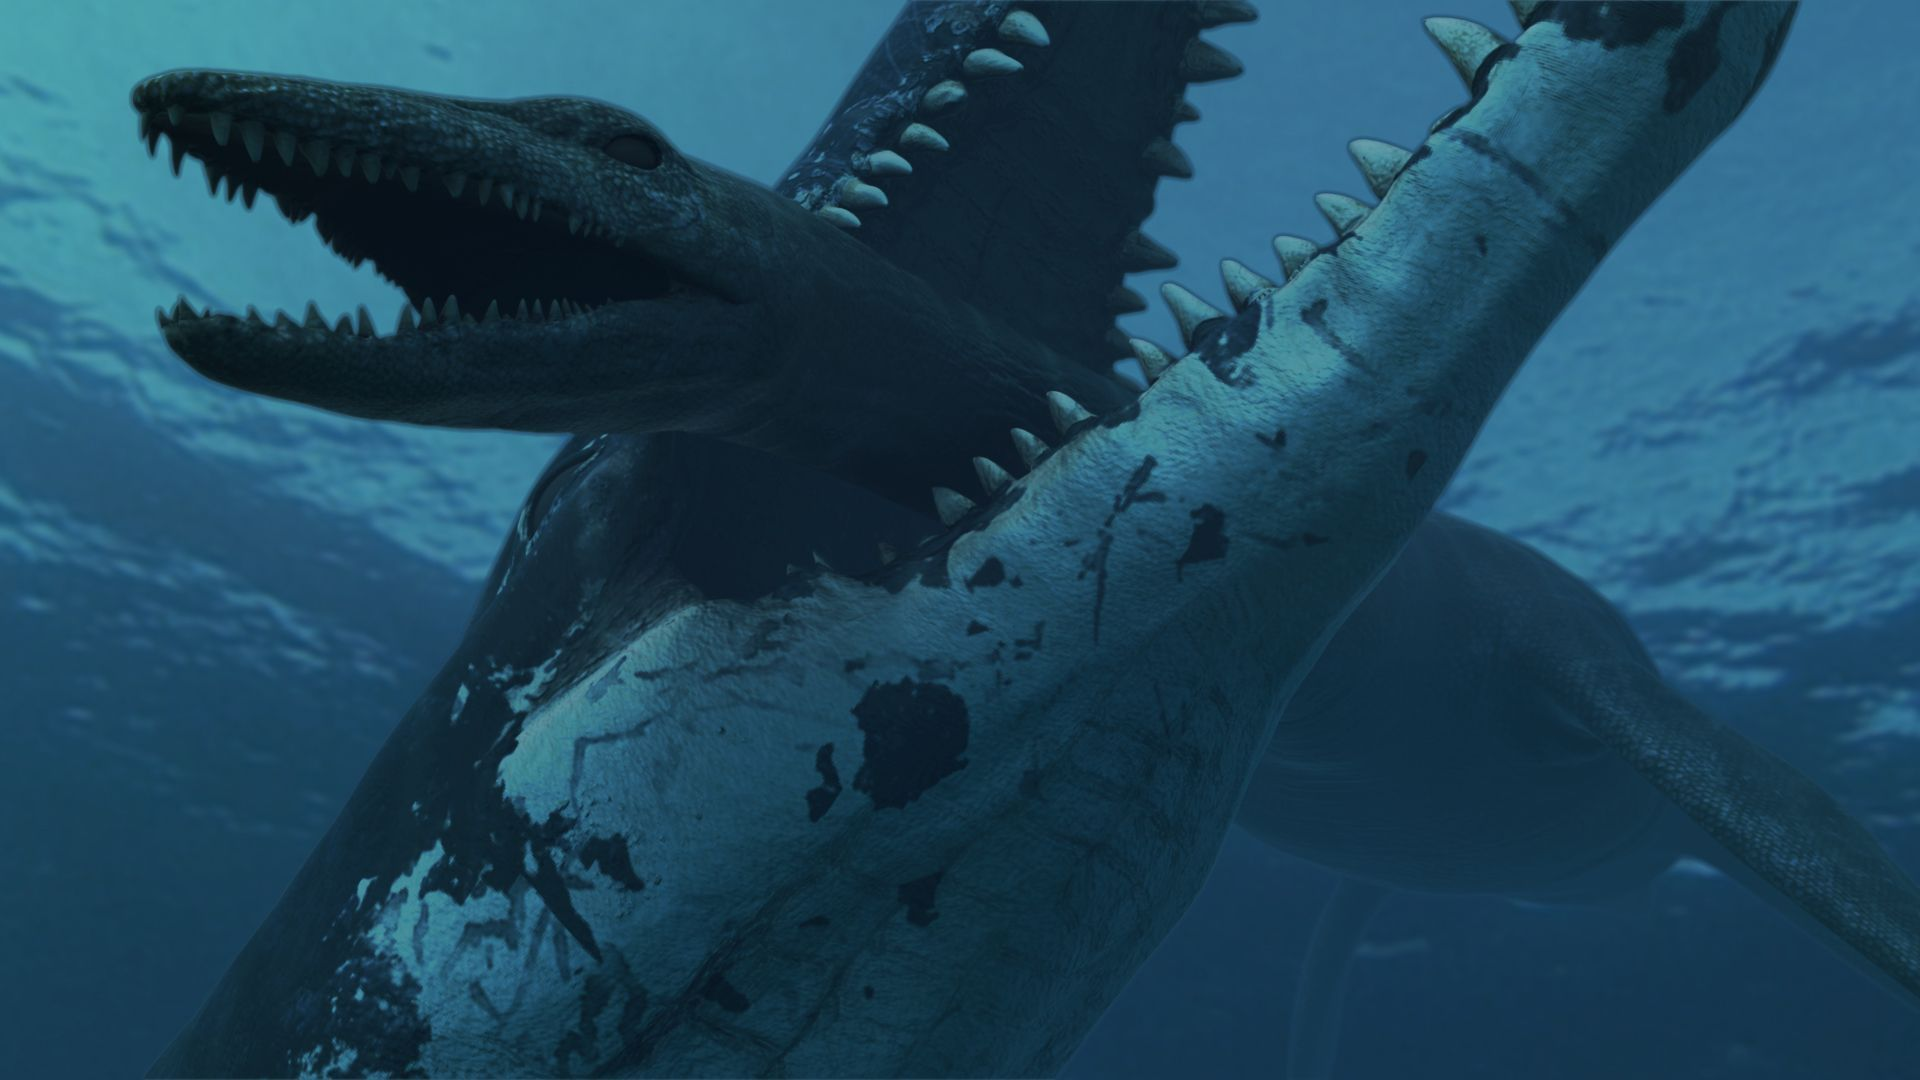 Pliosaur Killing Plesiosaur HD Wallpaper